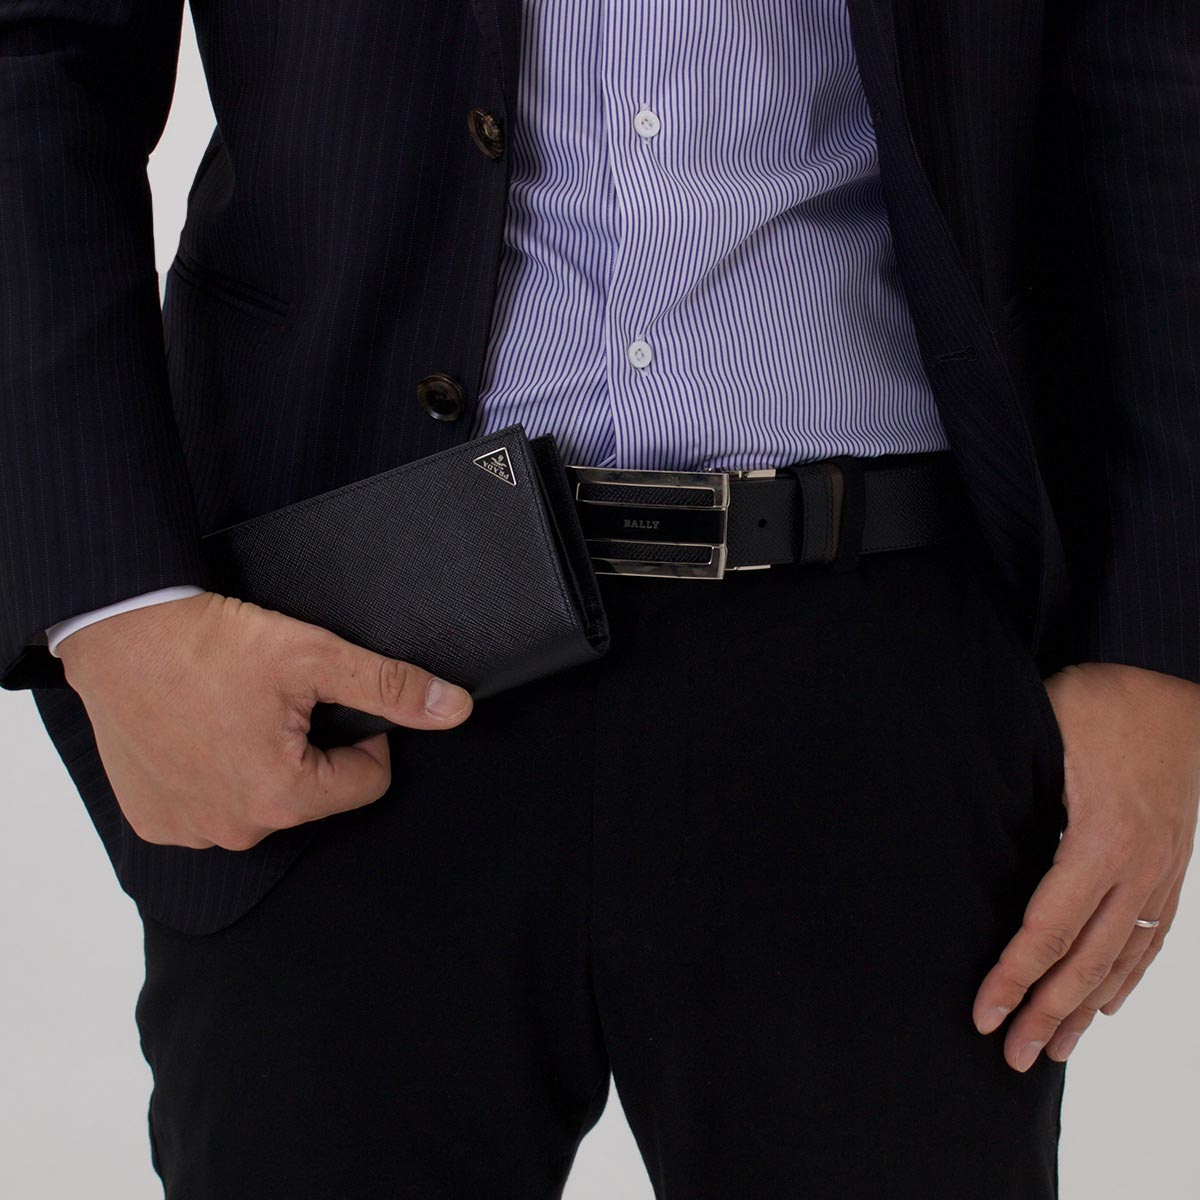 3d918bfab3f2 楽天市場】プラダ 長財布 財布 メンズ SAFFIANO TRIANG ブラック 2MV836 ...